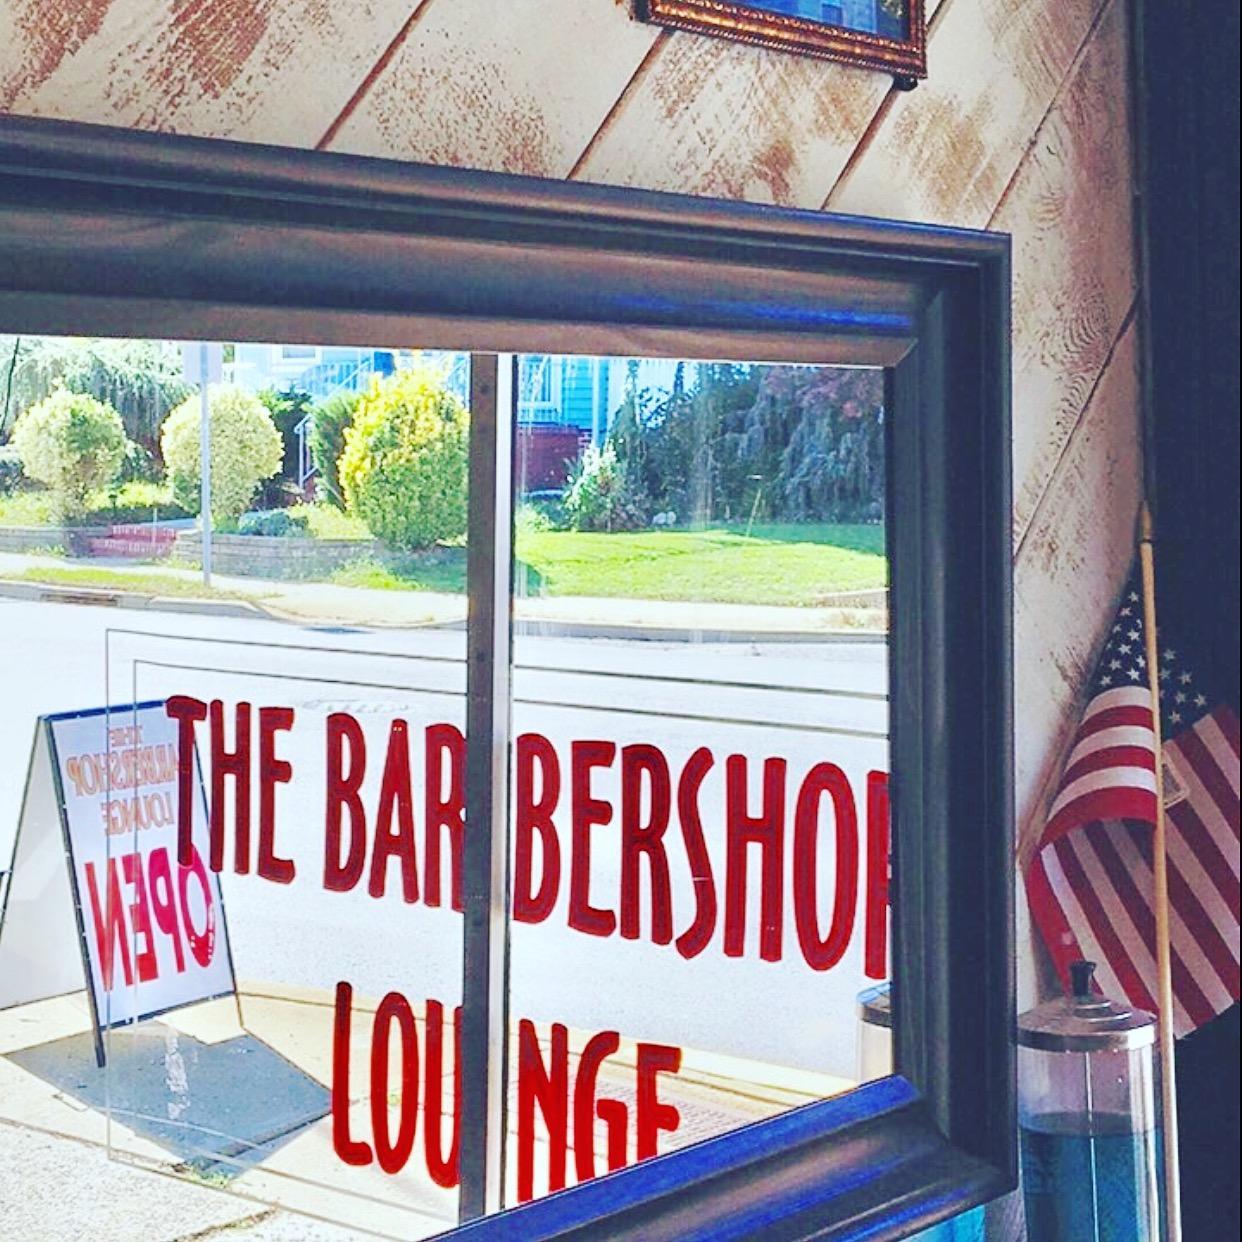 The Barbershop Lounge